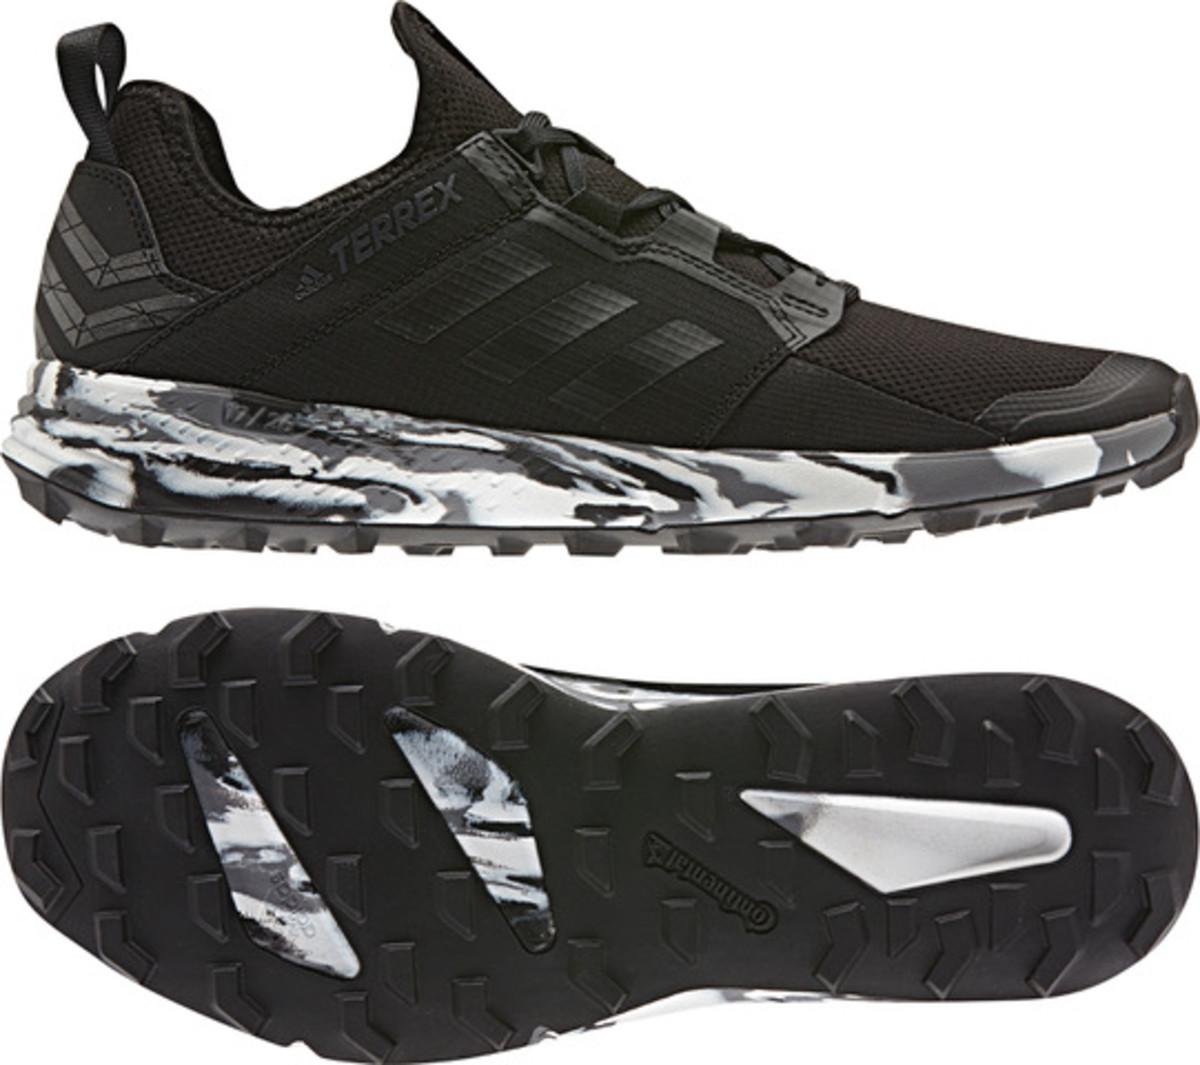 Adidas Terrex ss19